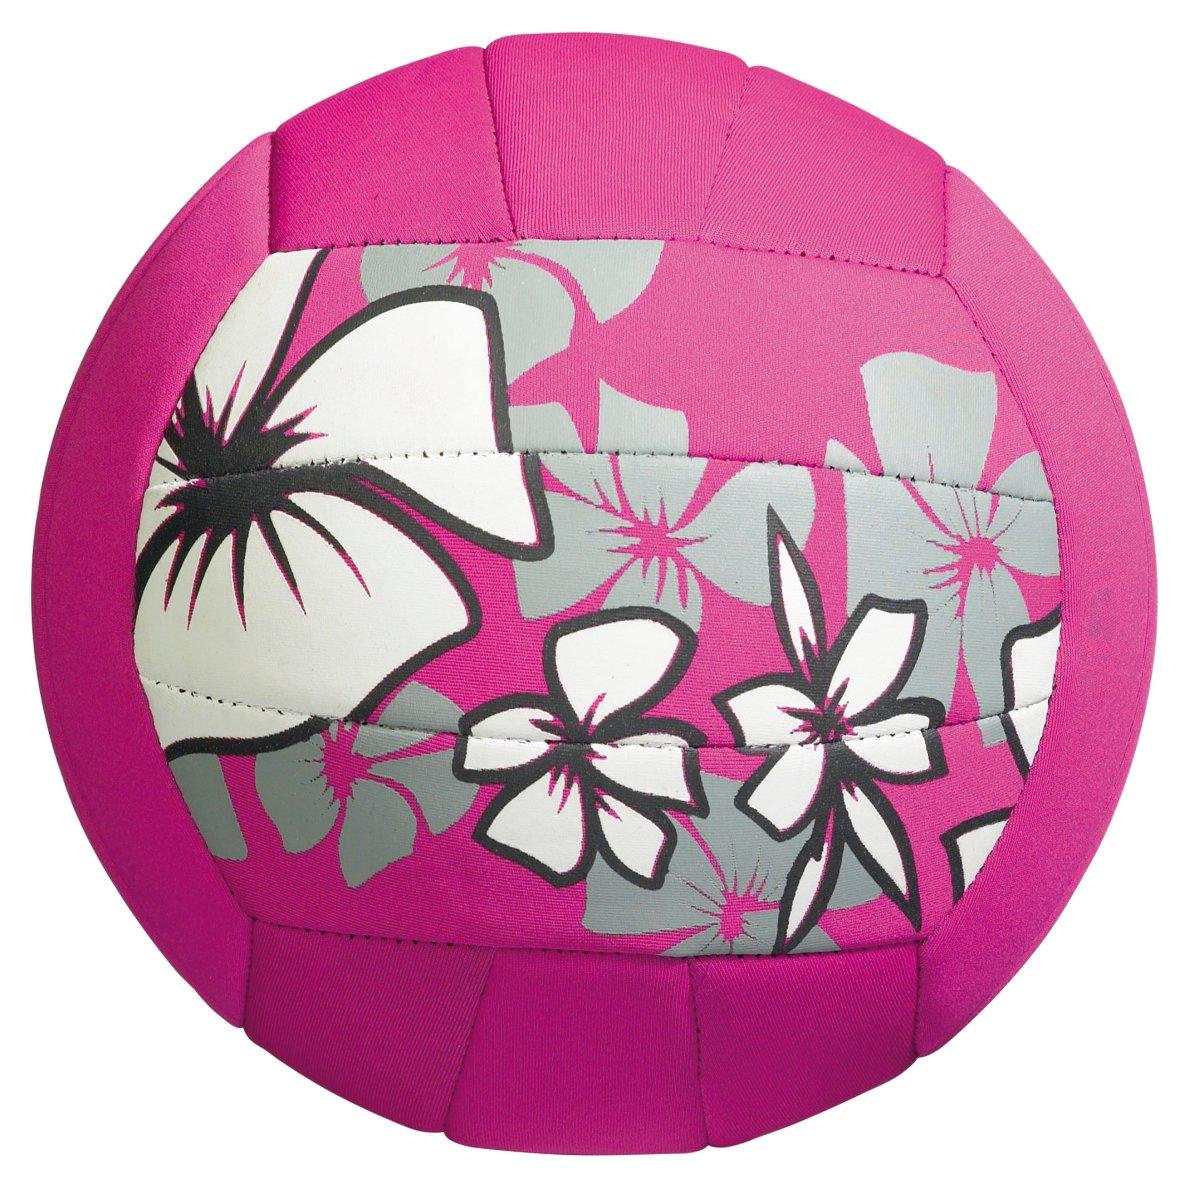 Strandball Neopren groot Roze